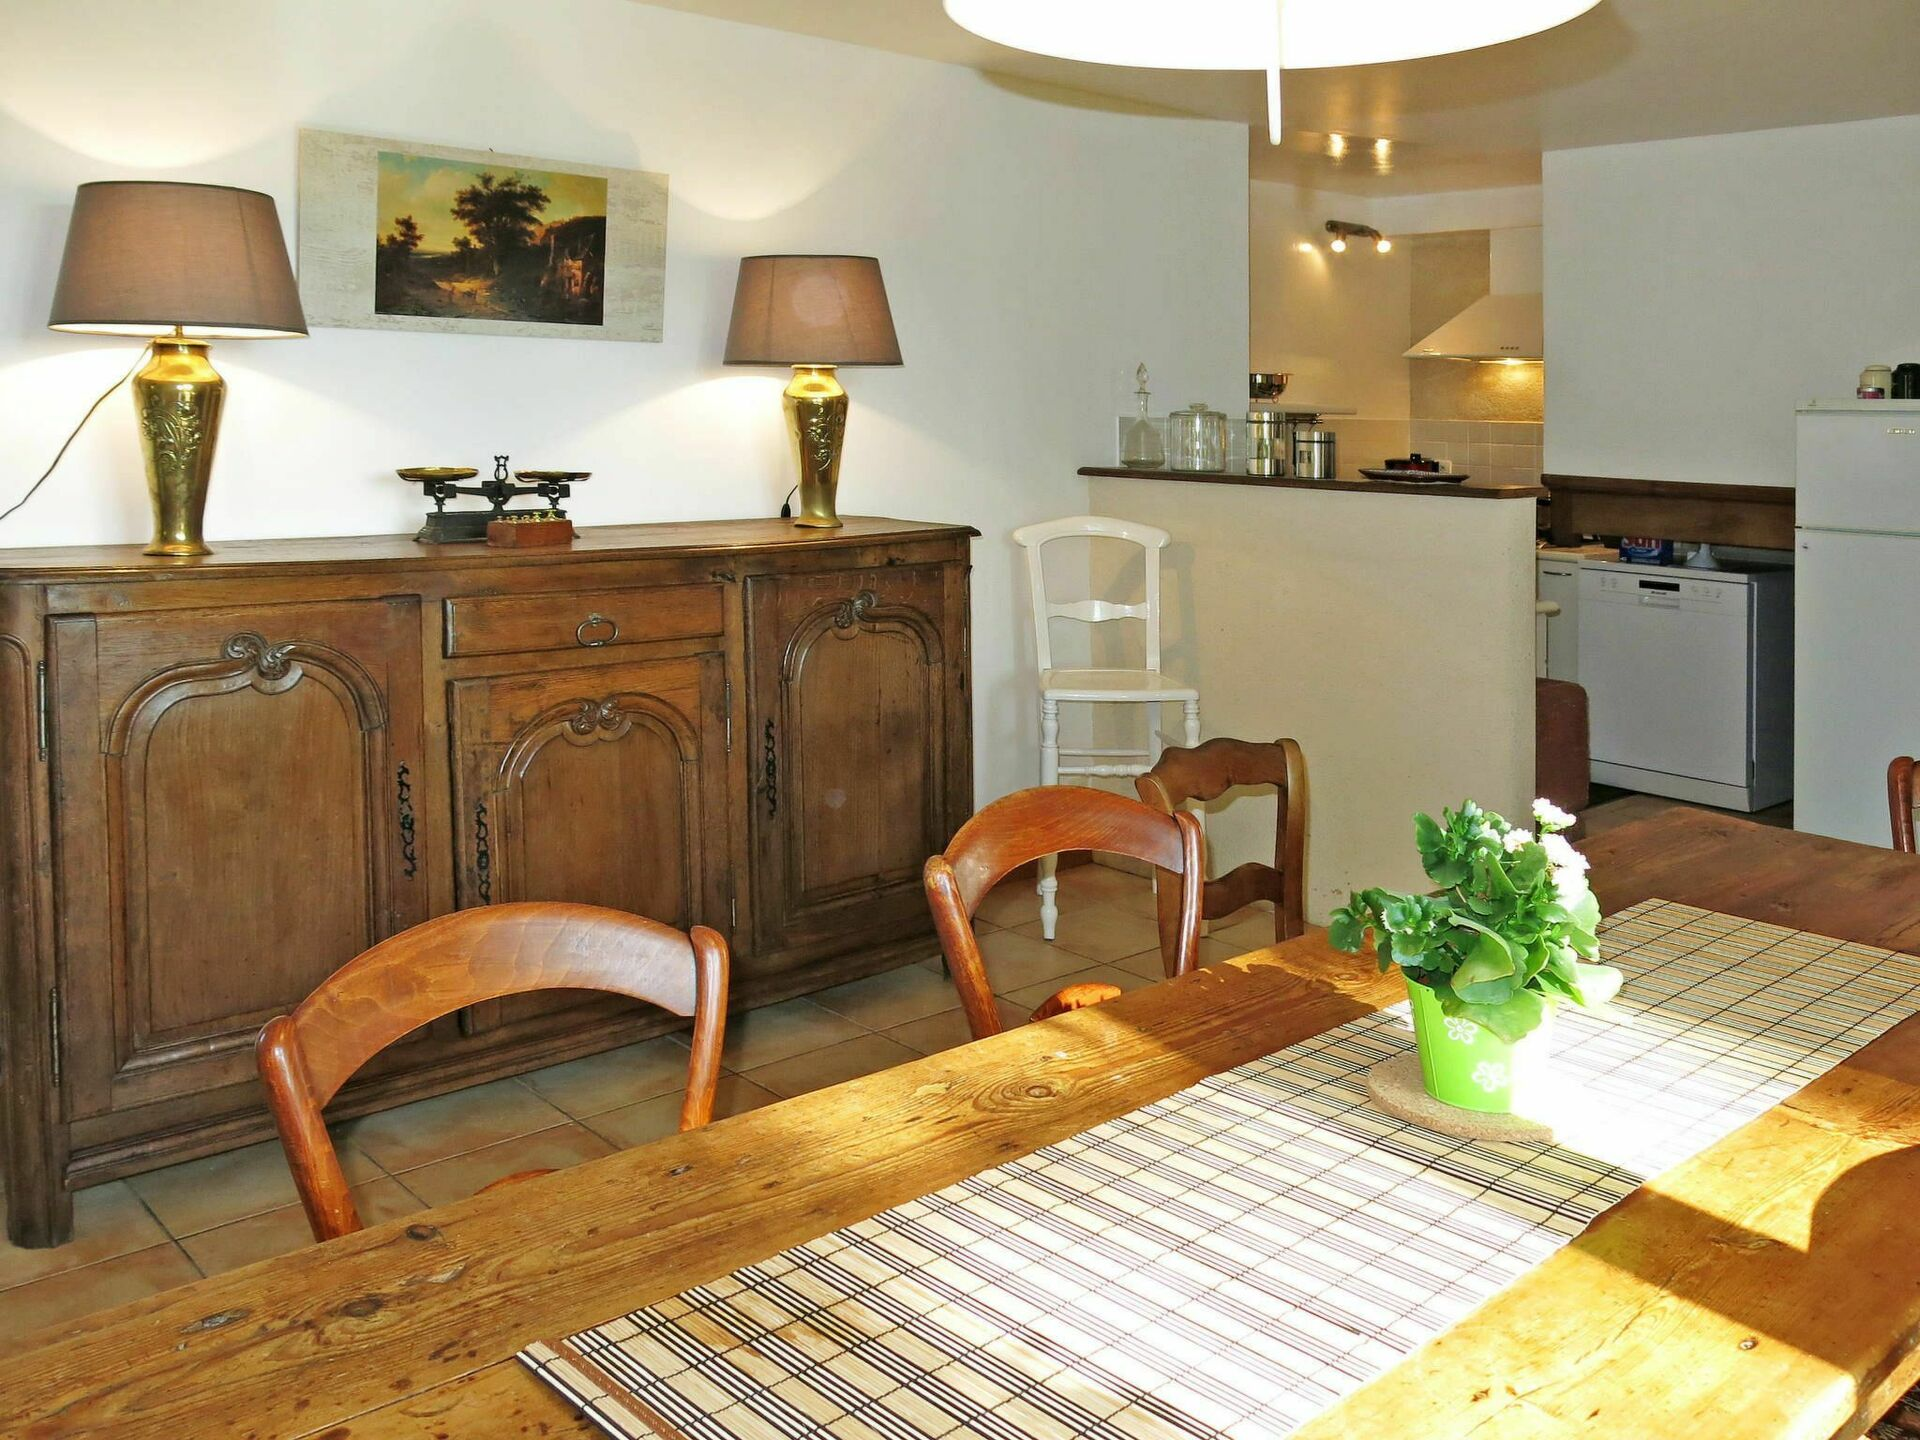 La Petite Herguerie Aud100 Vacation Rental That Sleeps 6 People